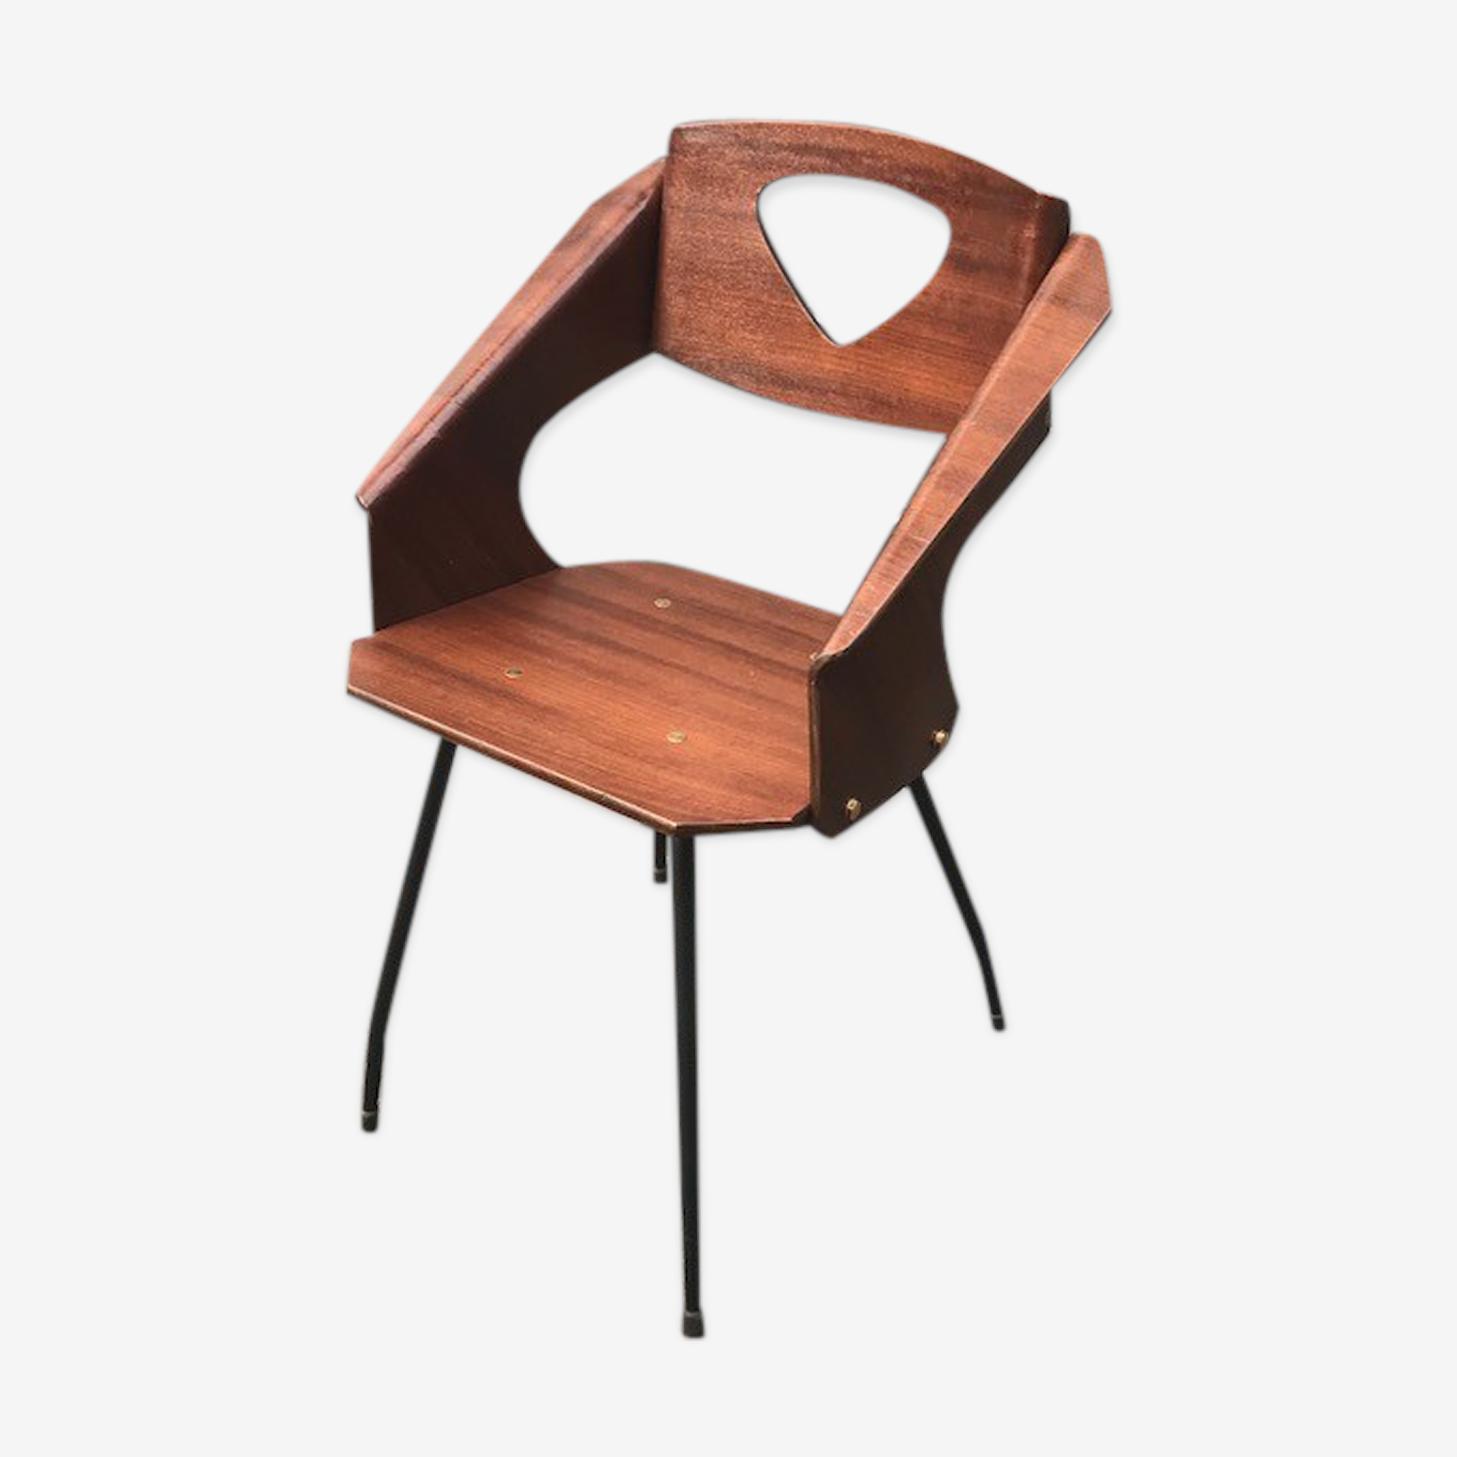 Design 4 chairs Carlo Di Carli, Italian suite